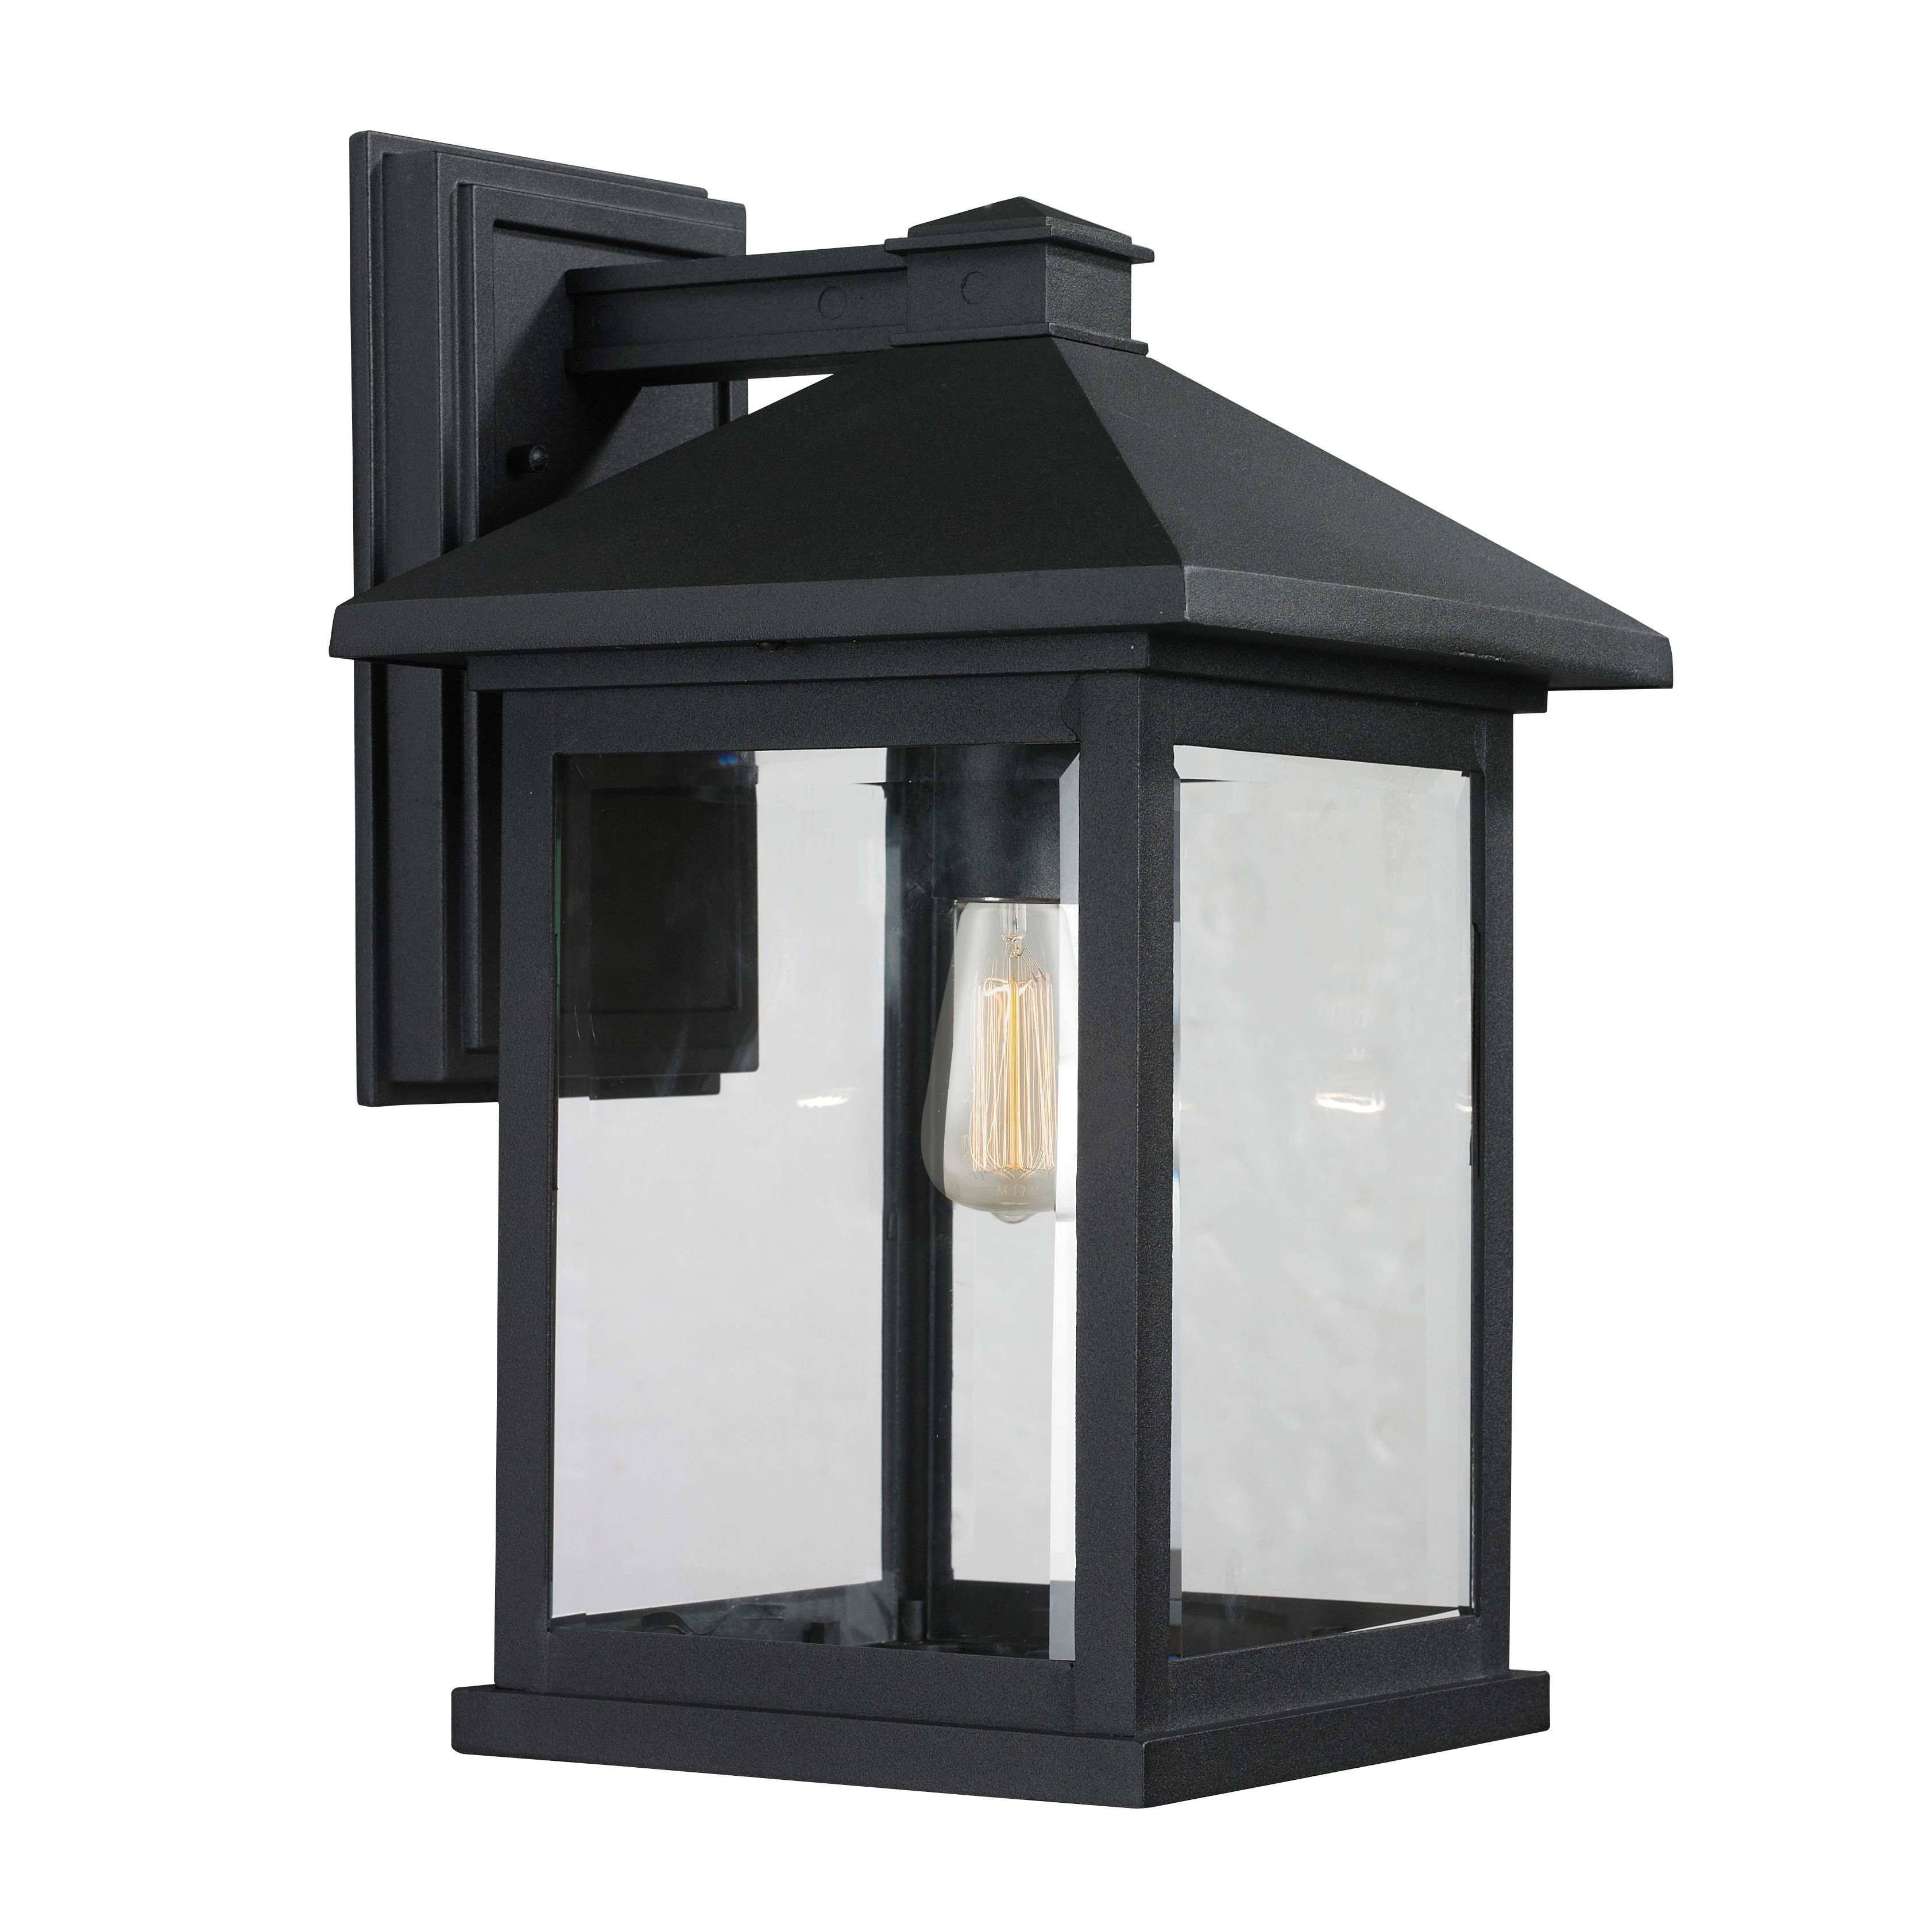 Avery home lighting portland light matte black outdoor wall light